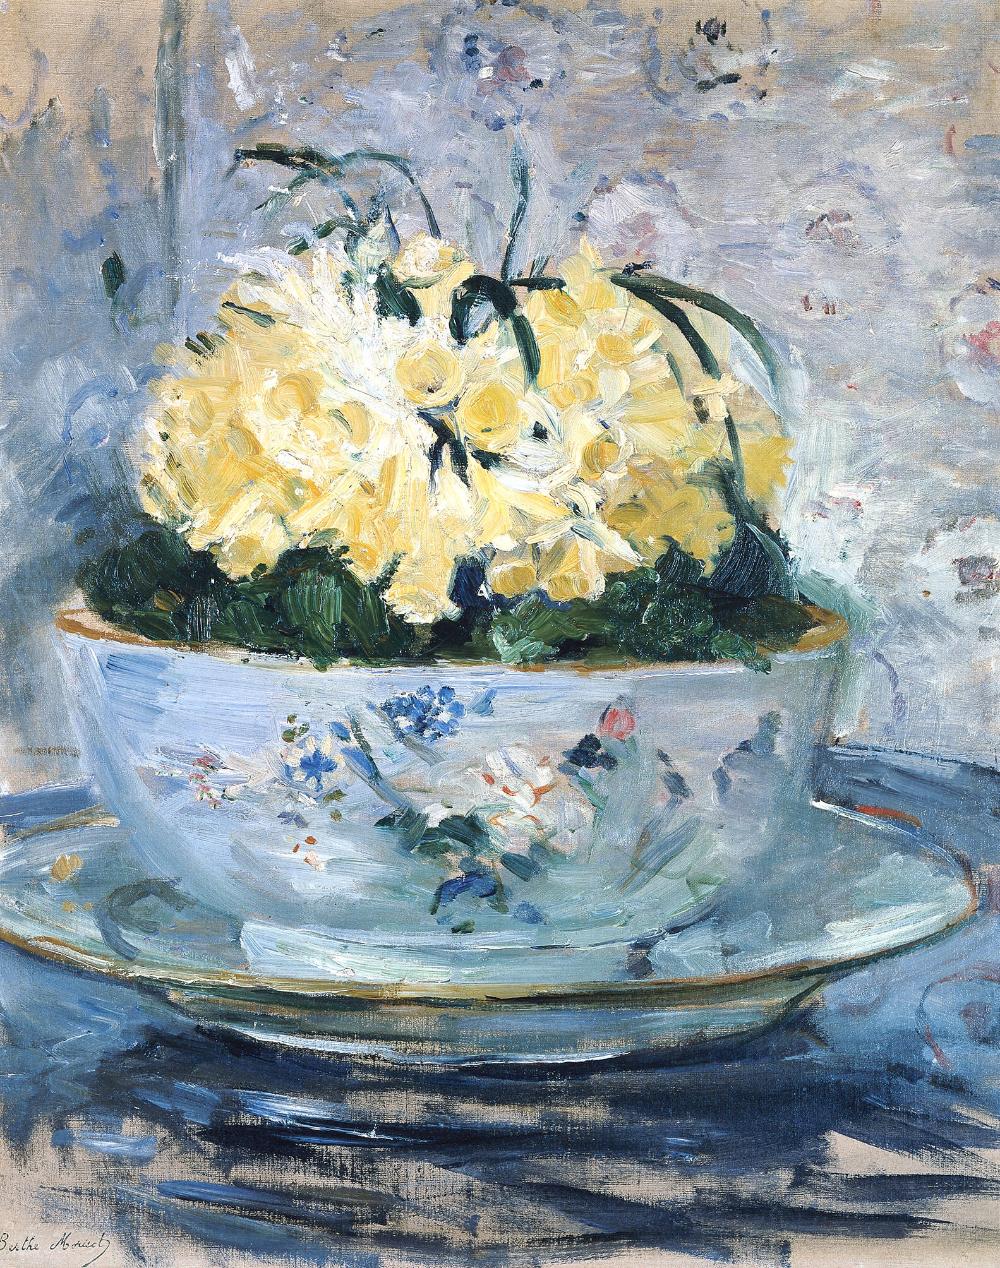 Berthe Morisot: Jonquilles [Jonquils, Narcisses, narcissi, Daffodils]  (1885) | Morisot, Berthe morisot, Renoir paintings